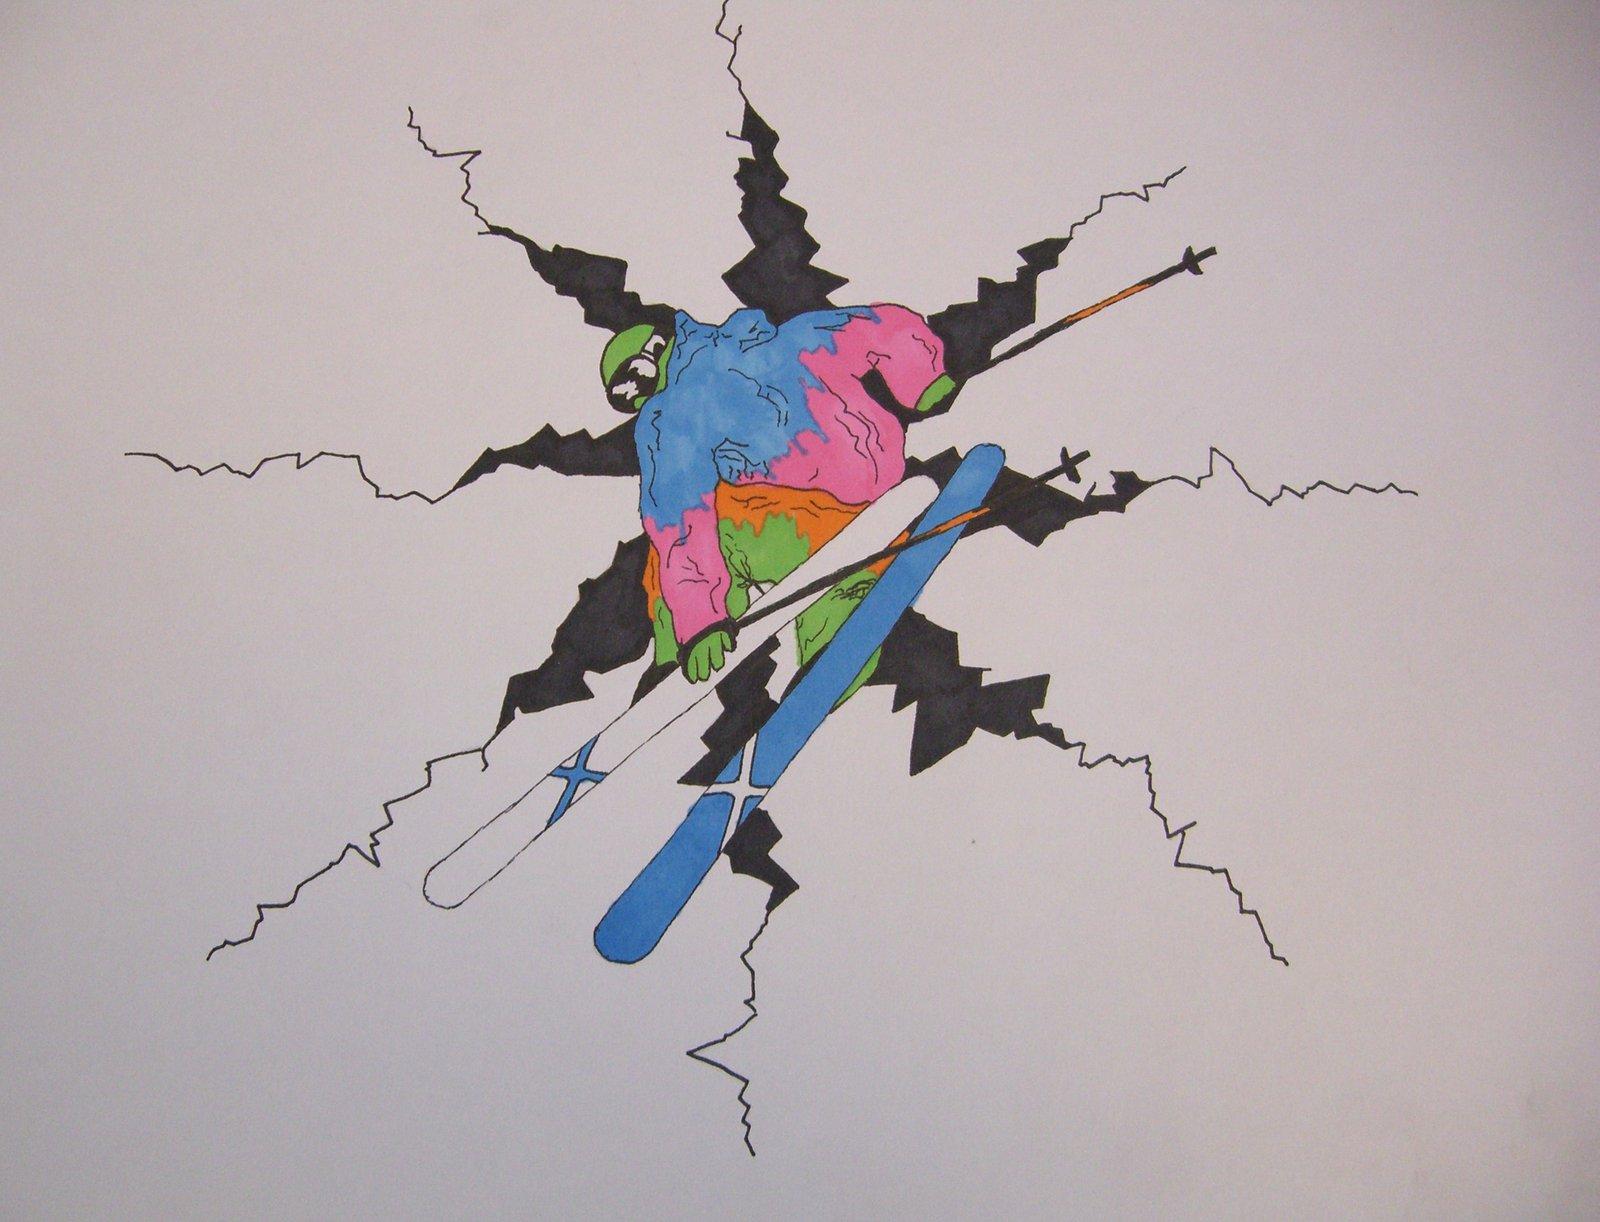 Skier drawing 2